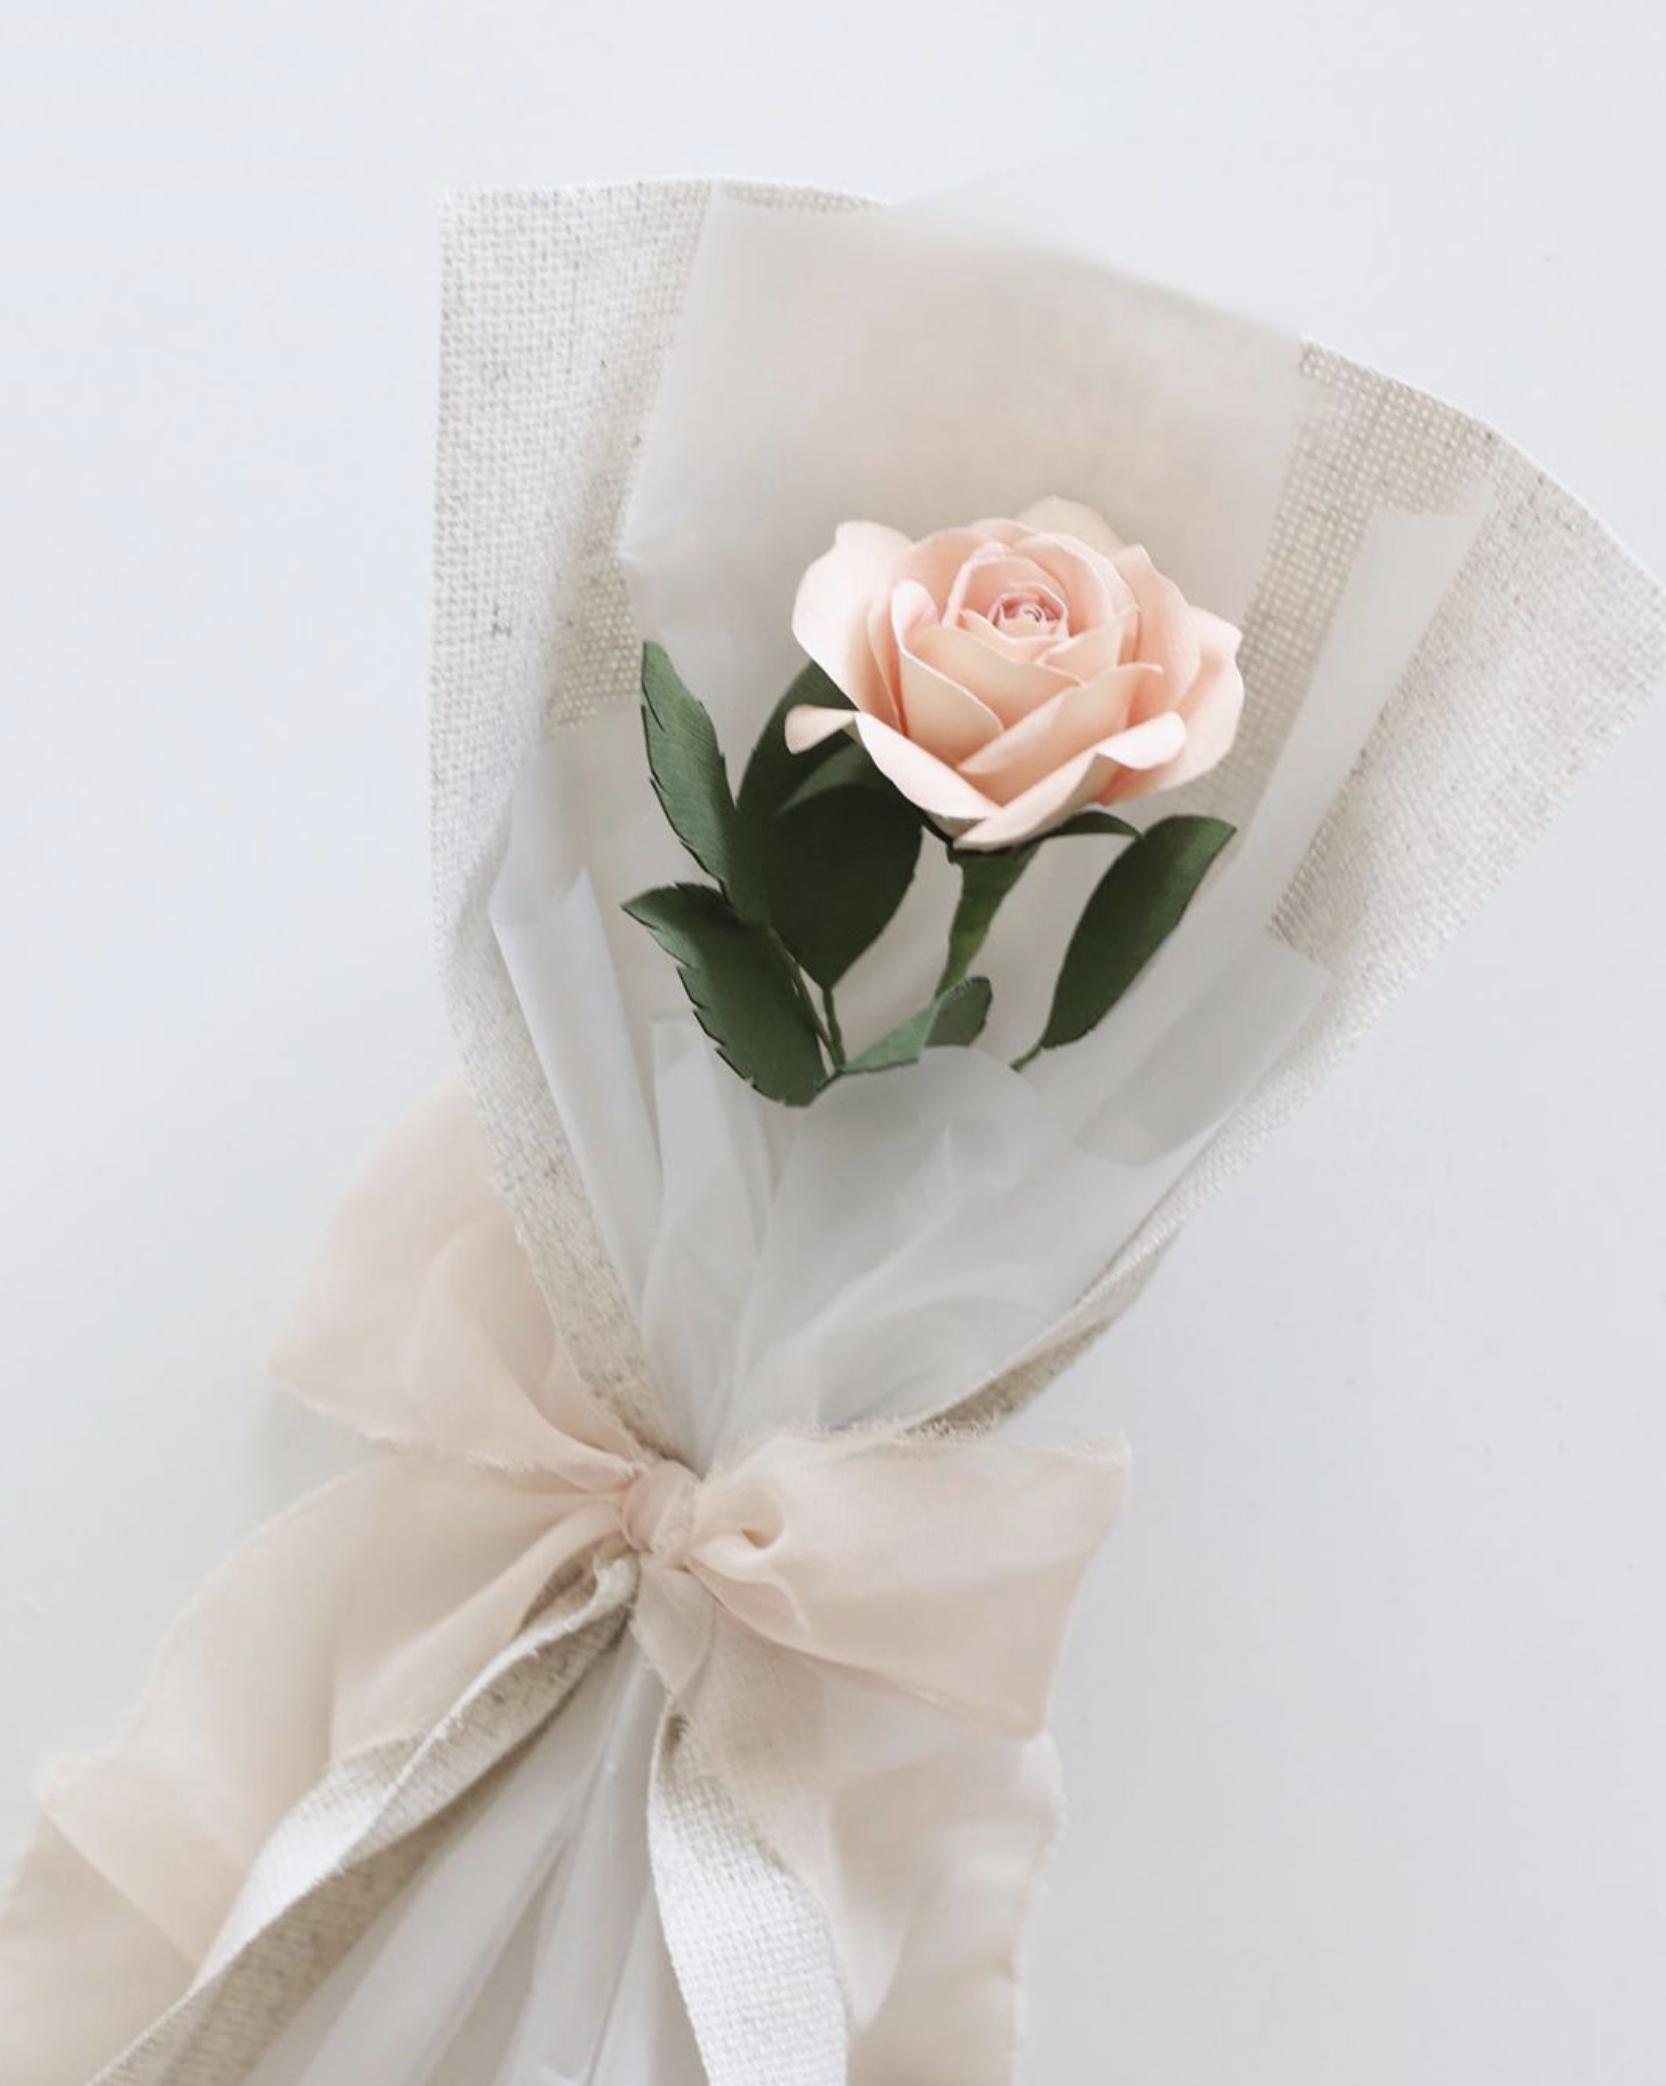 Single Flower Bouquet Handmade By Sara Kim